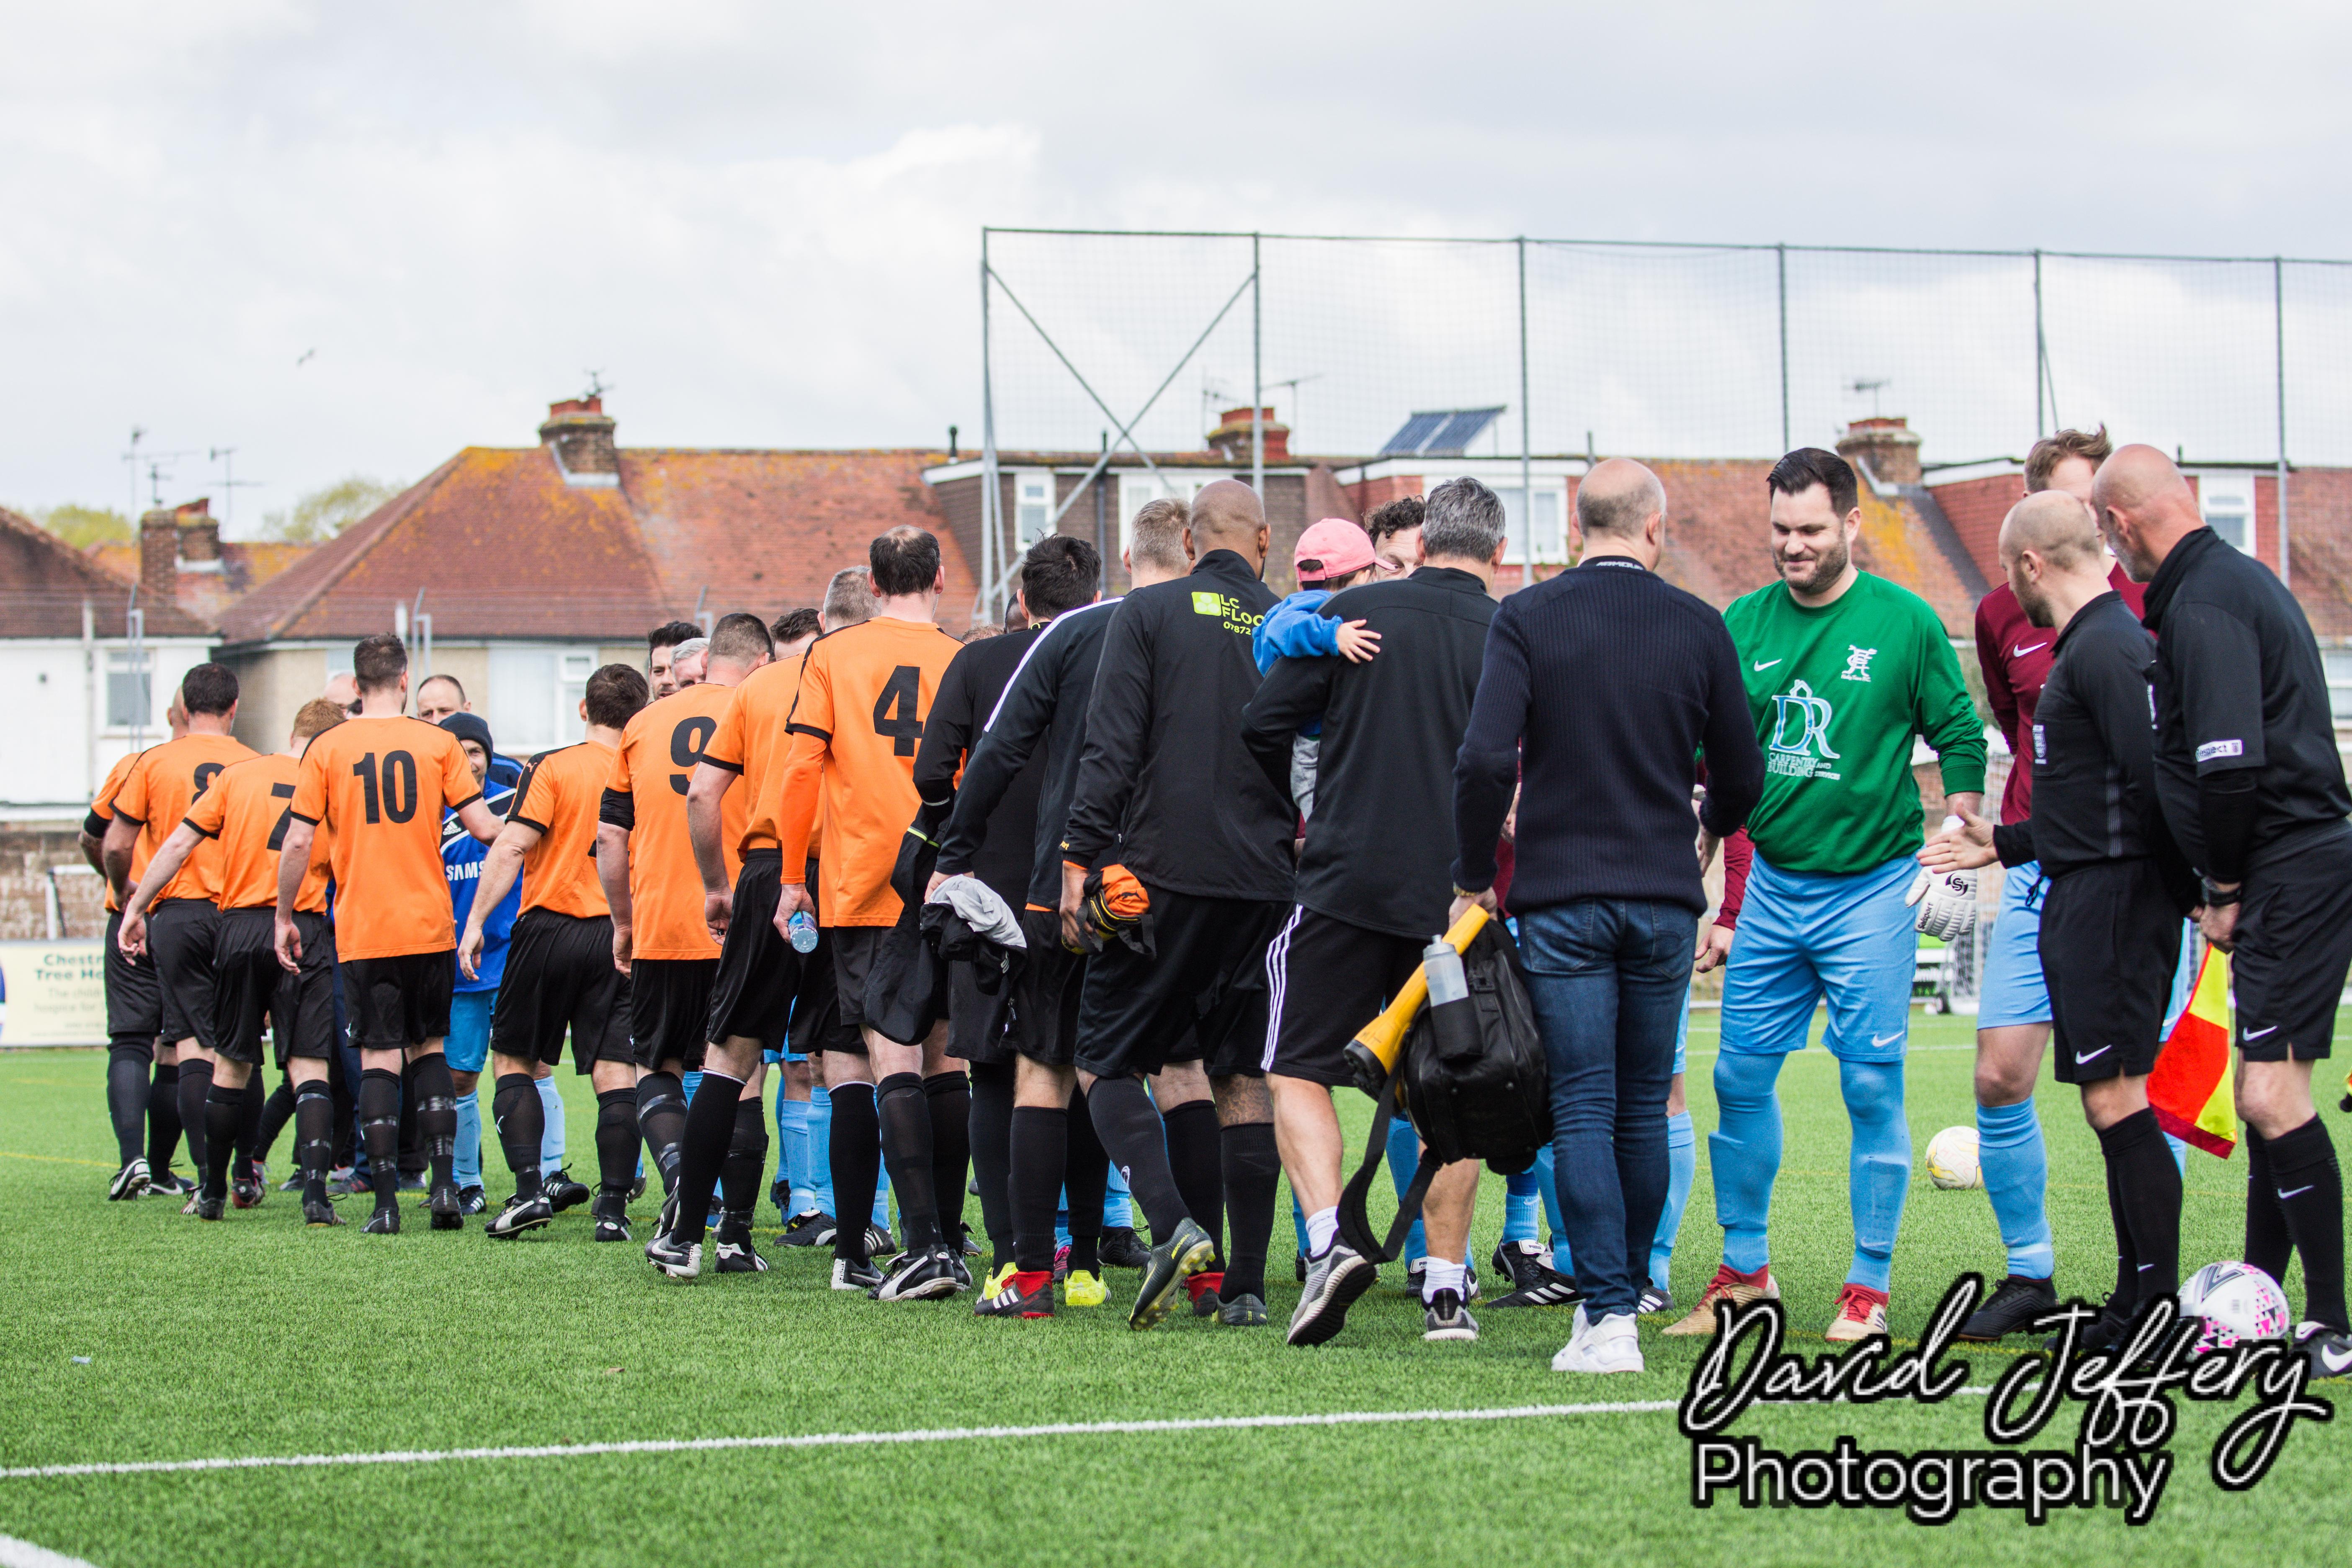 011 MOFC Vets vs Horl Vets 05.05